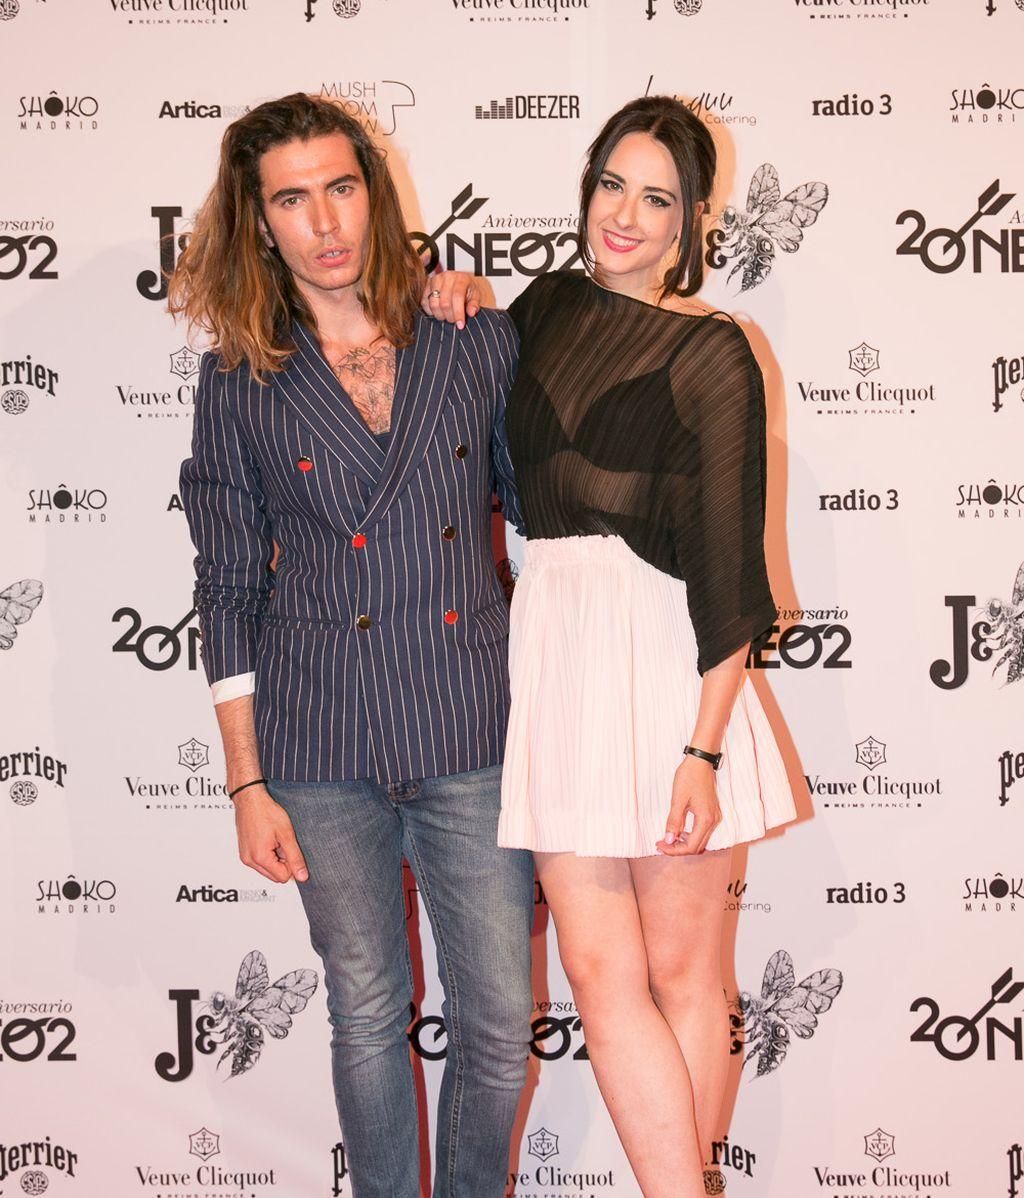 Jorge Parra y Laura Put en el 'photocall'